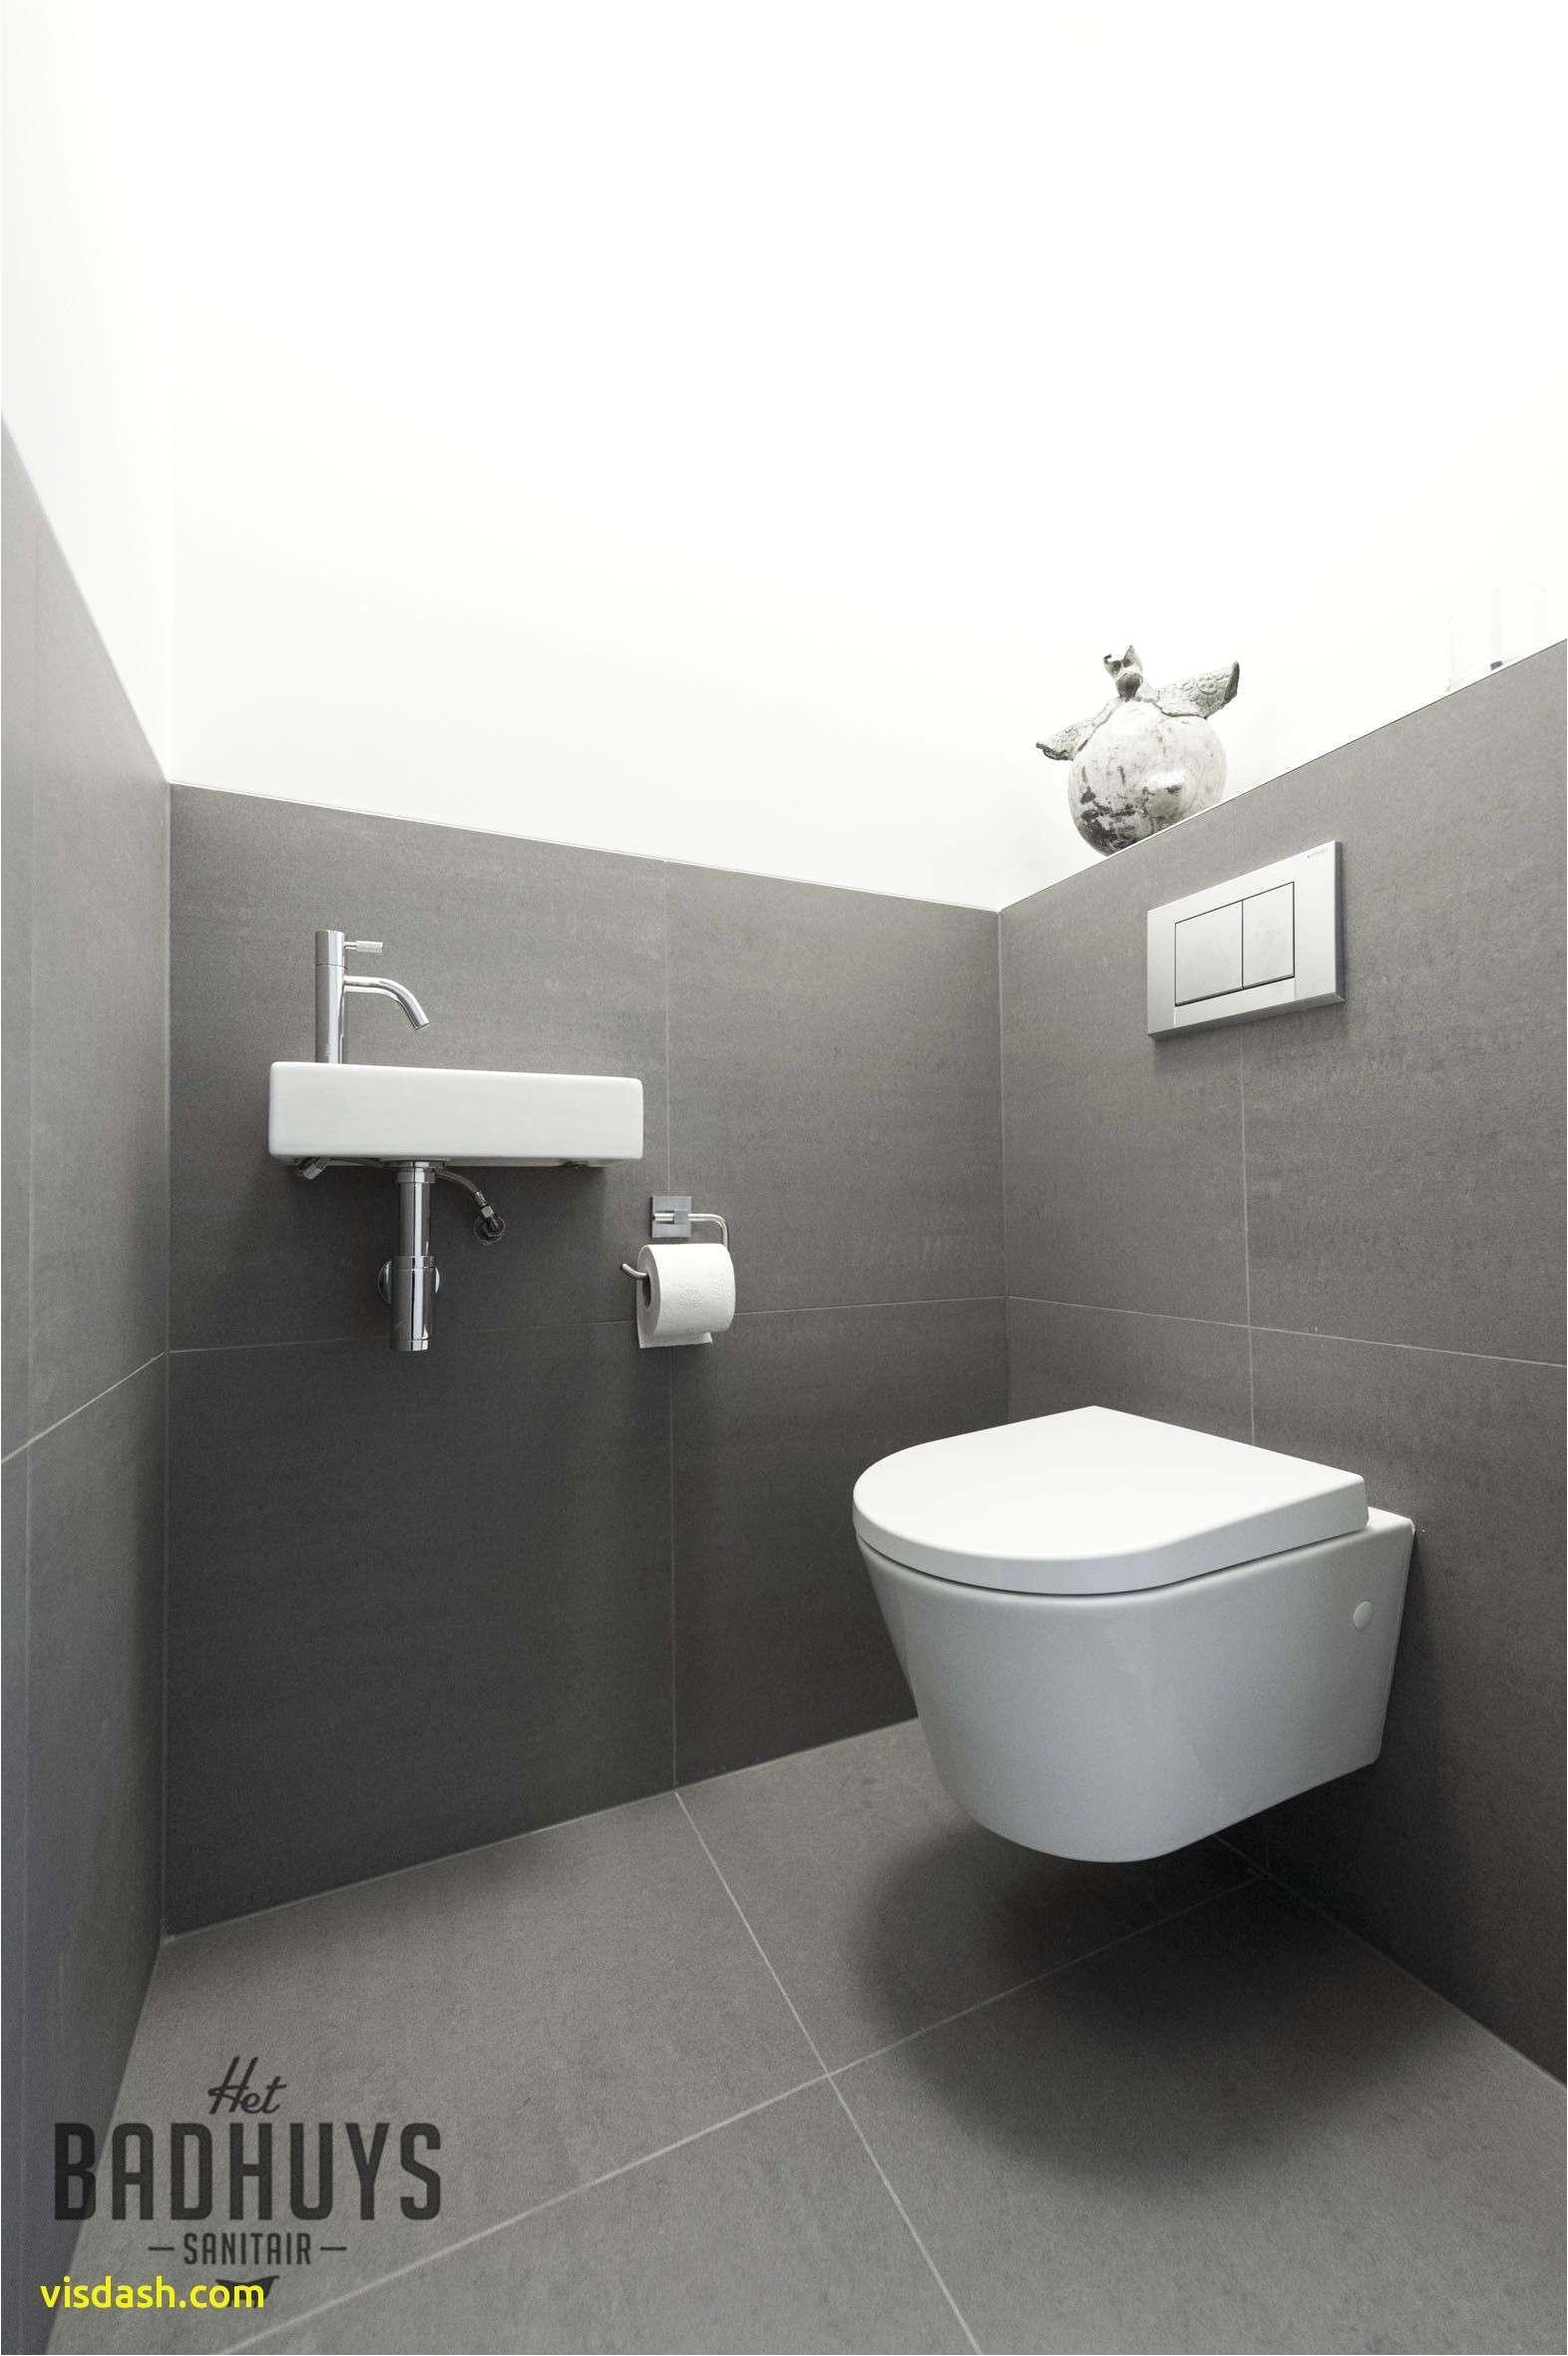 Bathroom Design Ideas Walk In Shower 20 Modern Bathroom Designs 2019 Modern Bathroom Design Ideas with